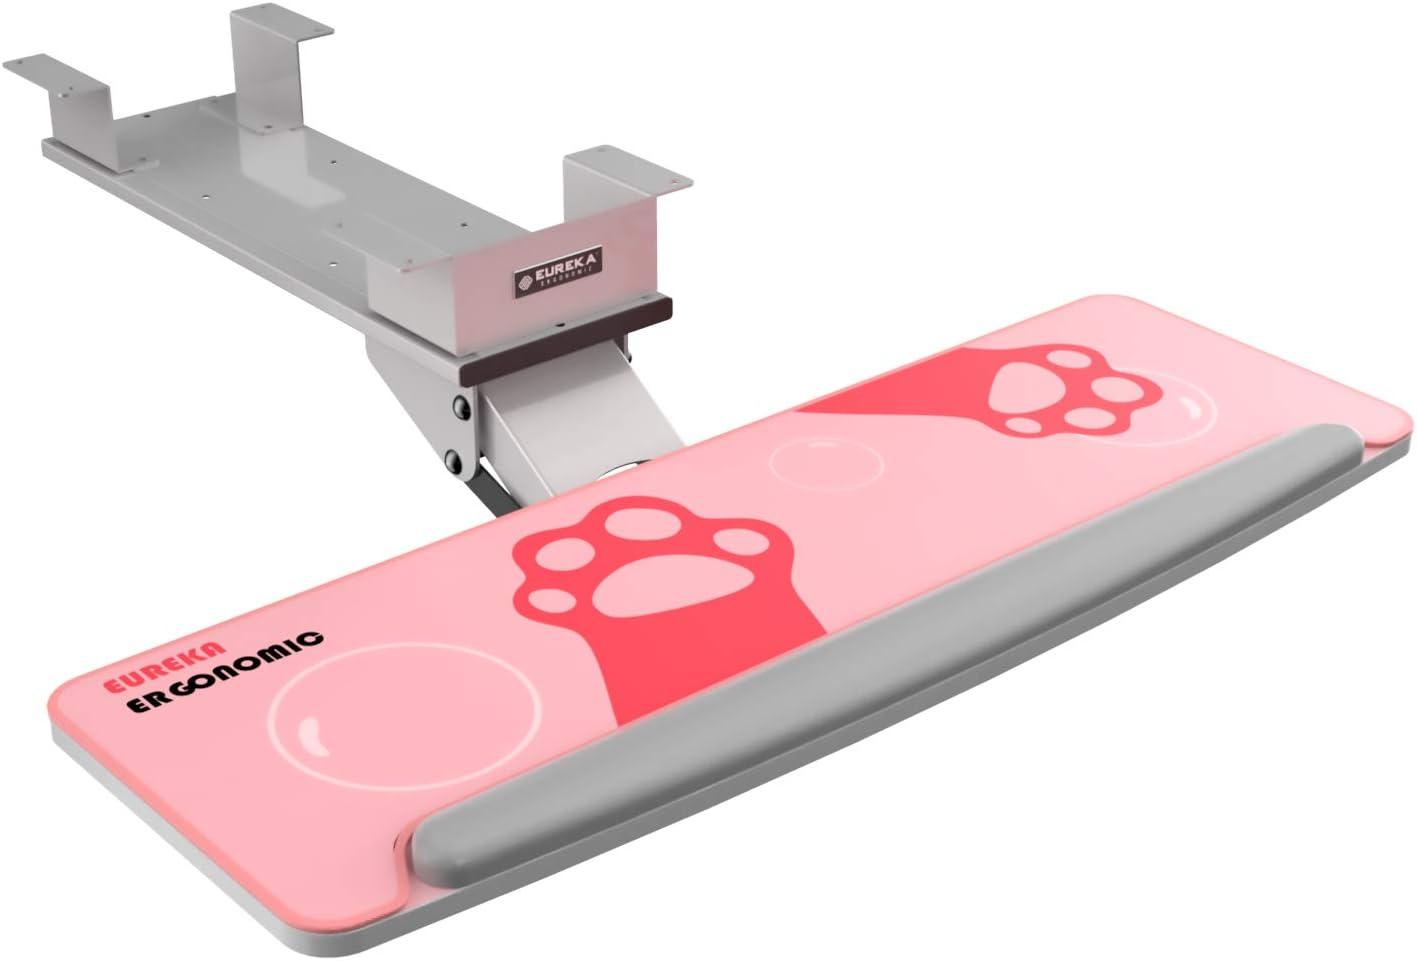 EUREKA ERGONOMIC Adjustable Keyboard Tray Mouse Platform, Under Desk Keyboard Drawer with Free Mouse Pad, Gray